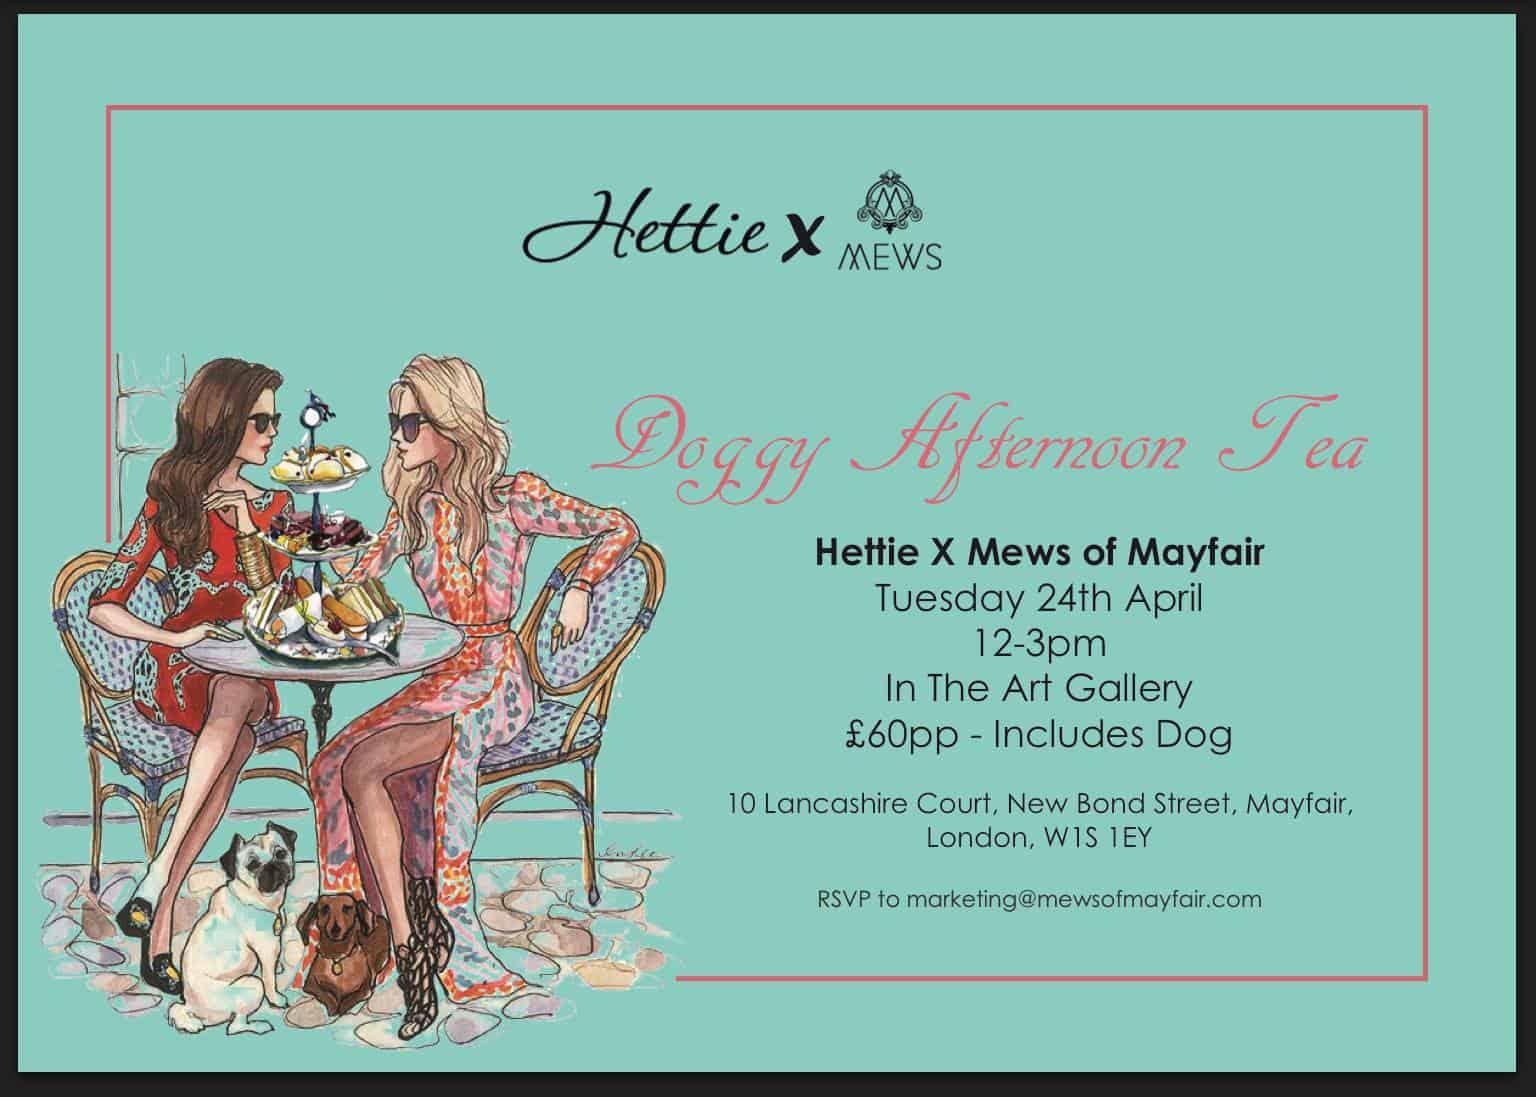 London Dog Events - Hettie x Mews of Mayfair Doggy Afternoon Tea